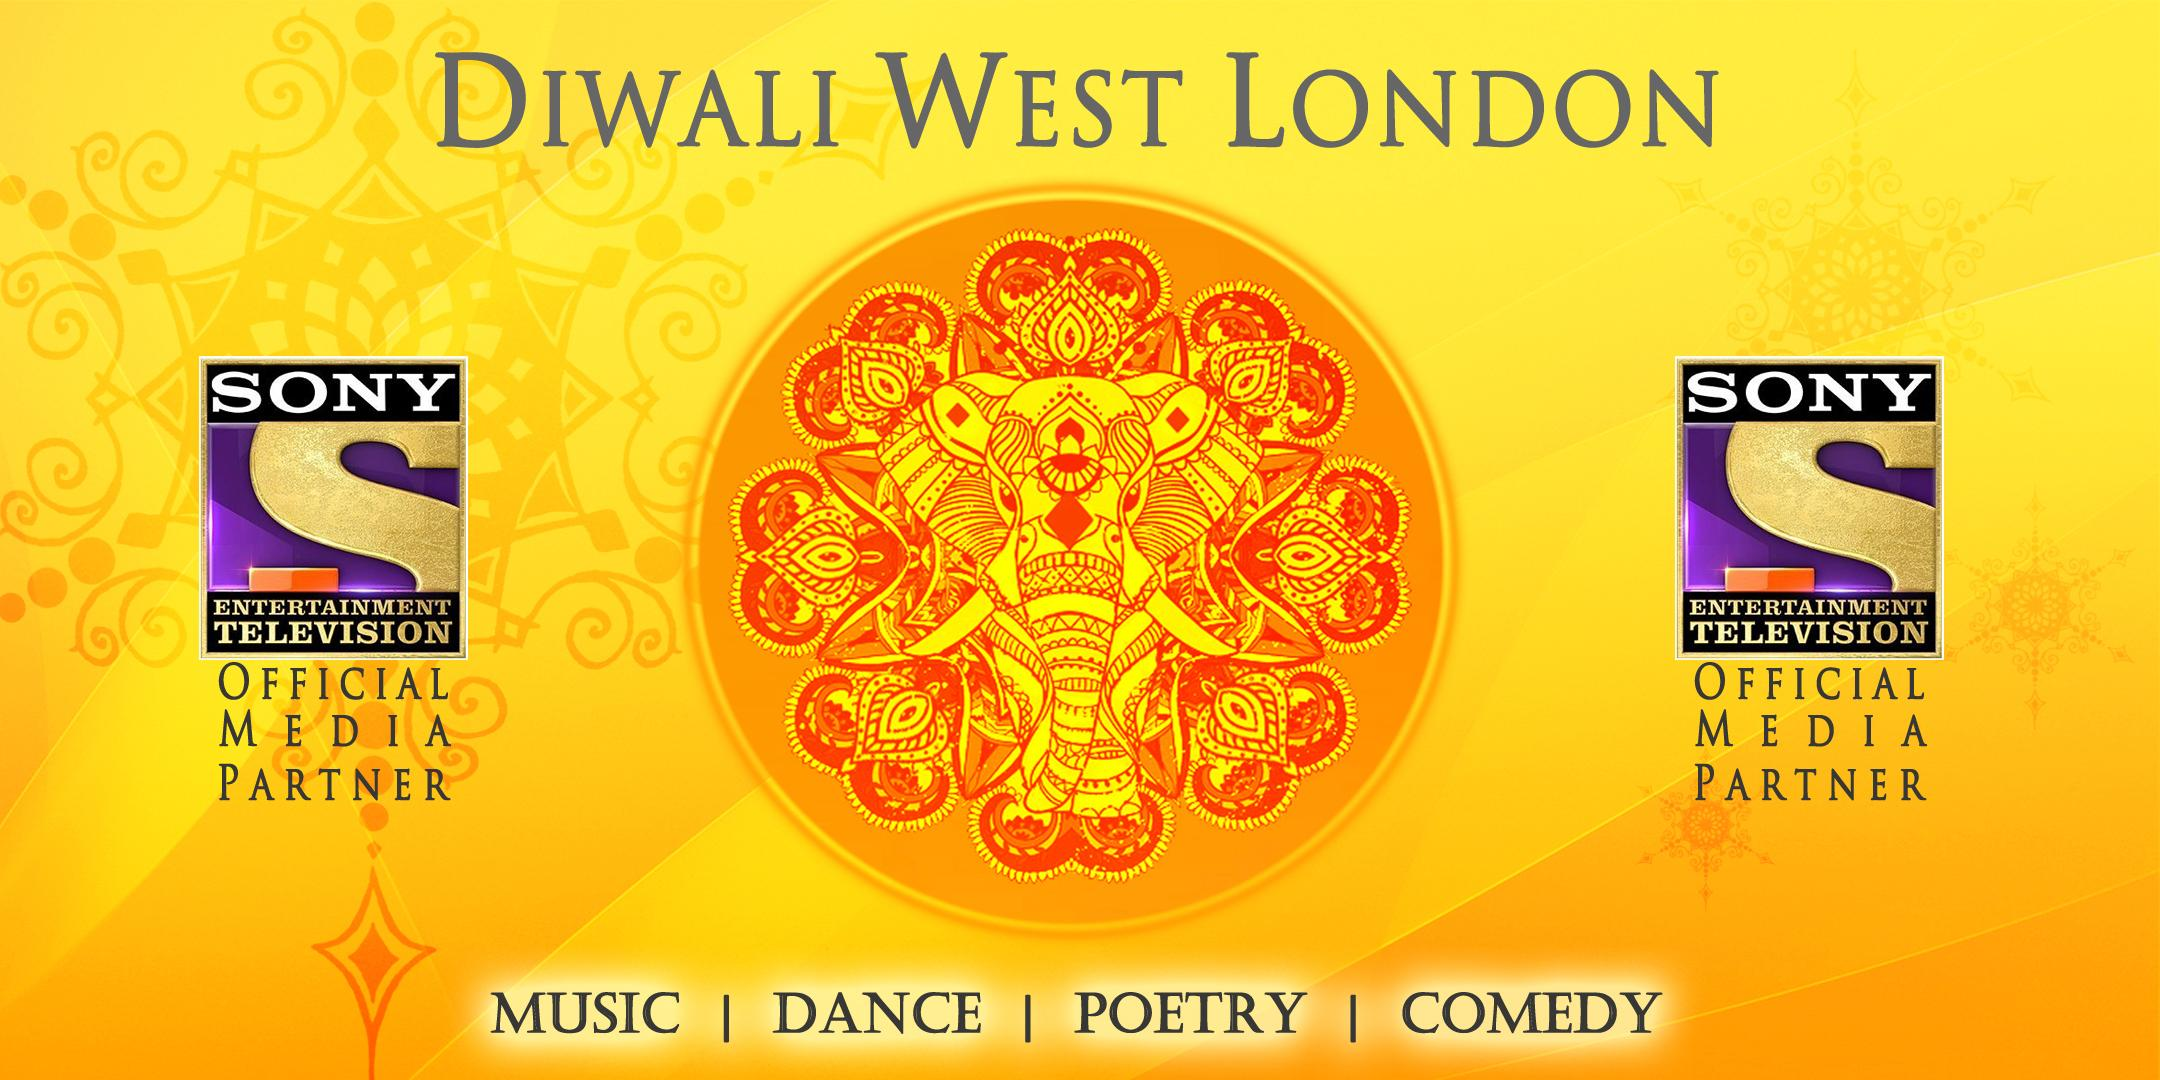 Diwali West London - Music, Dance, Poetry, Comedy